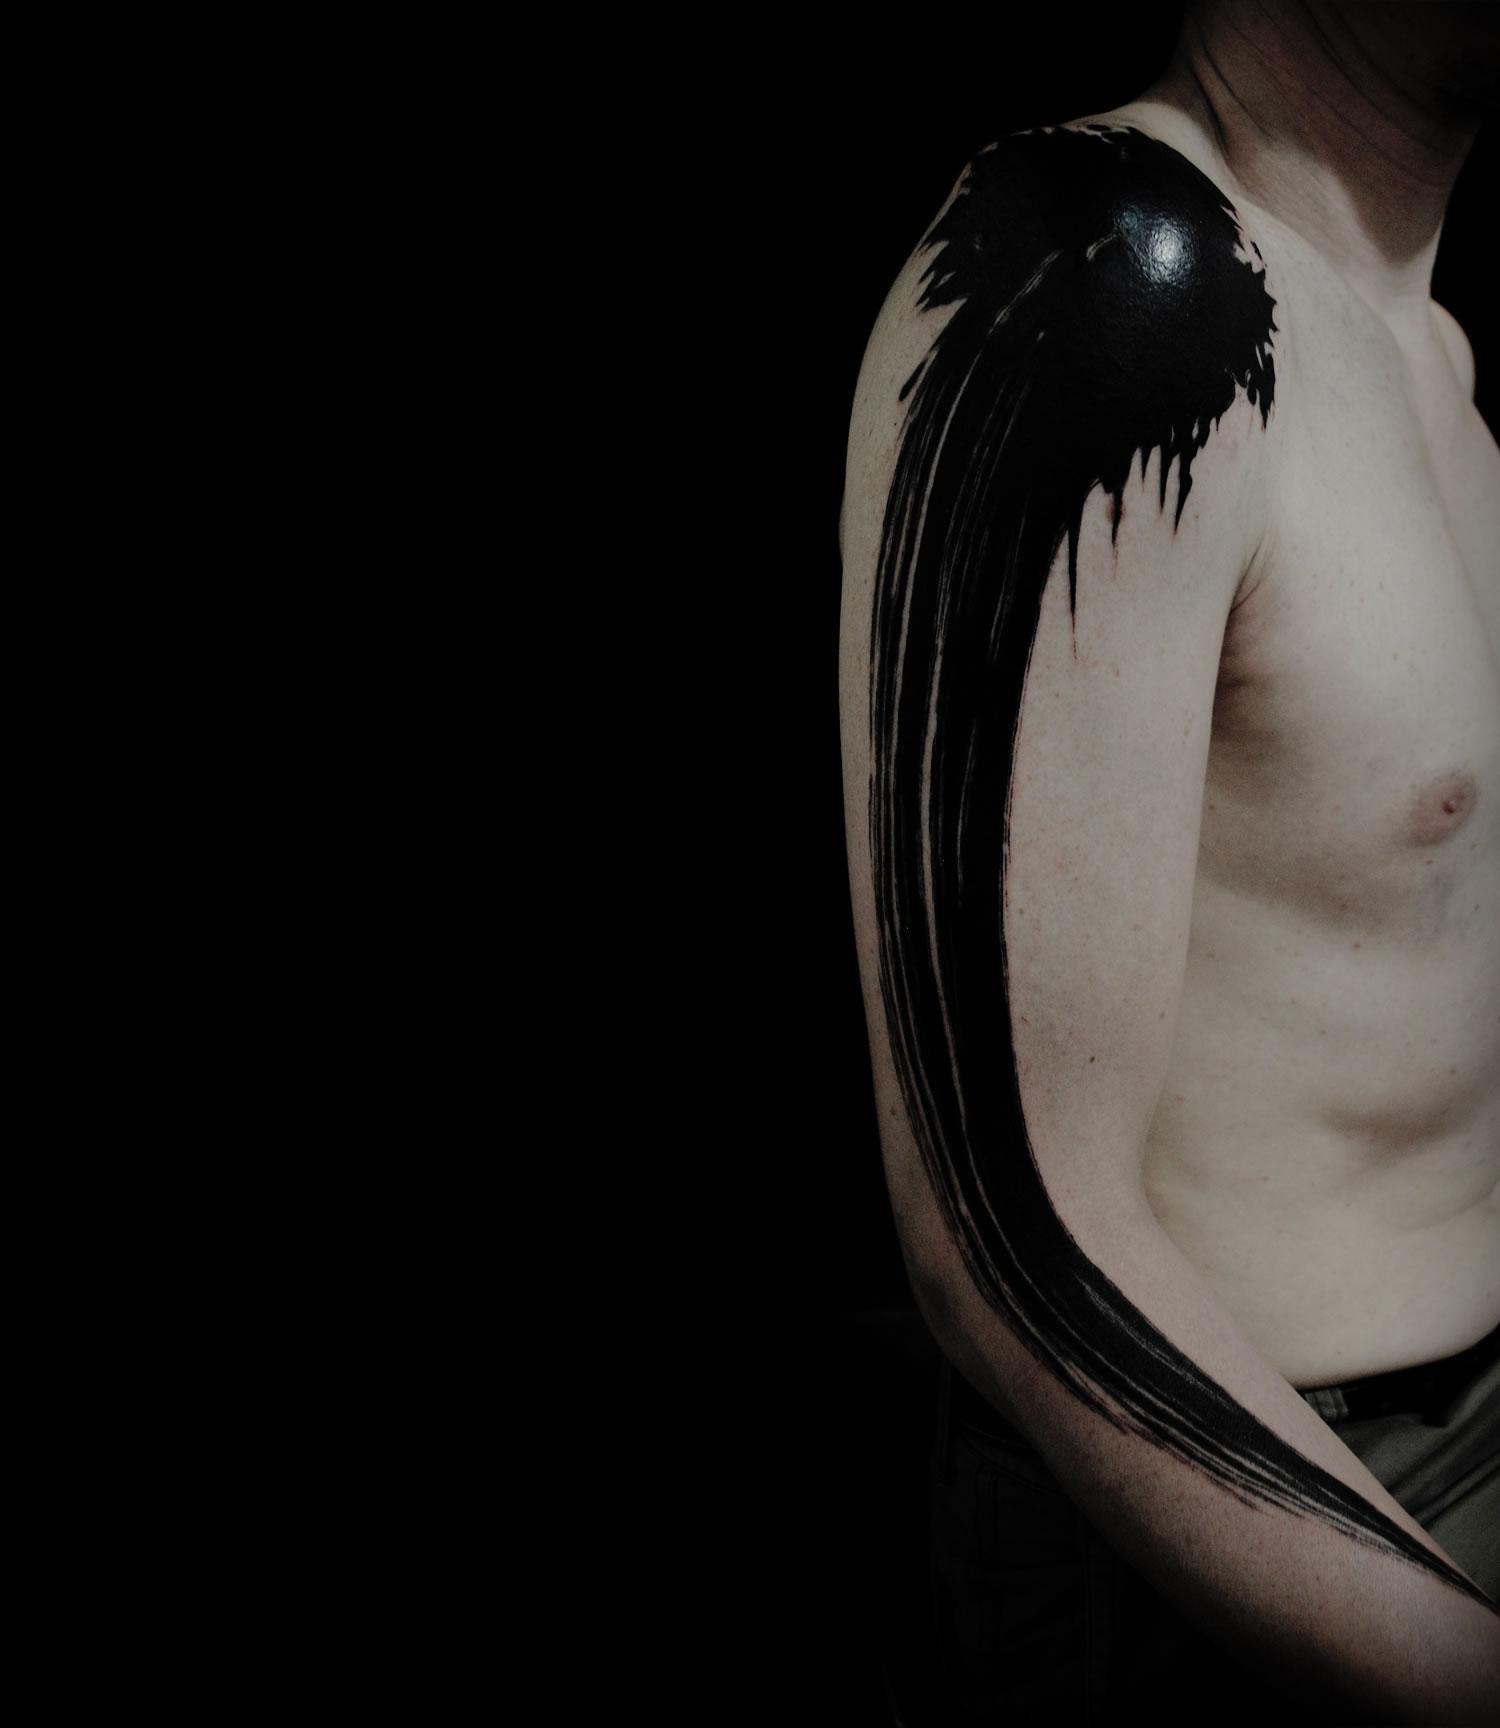 ink painting tattoo on arm, black ink